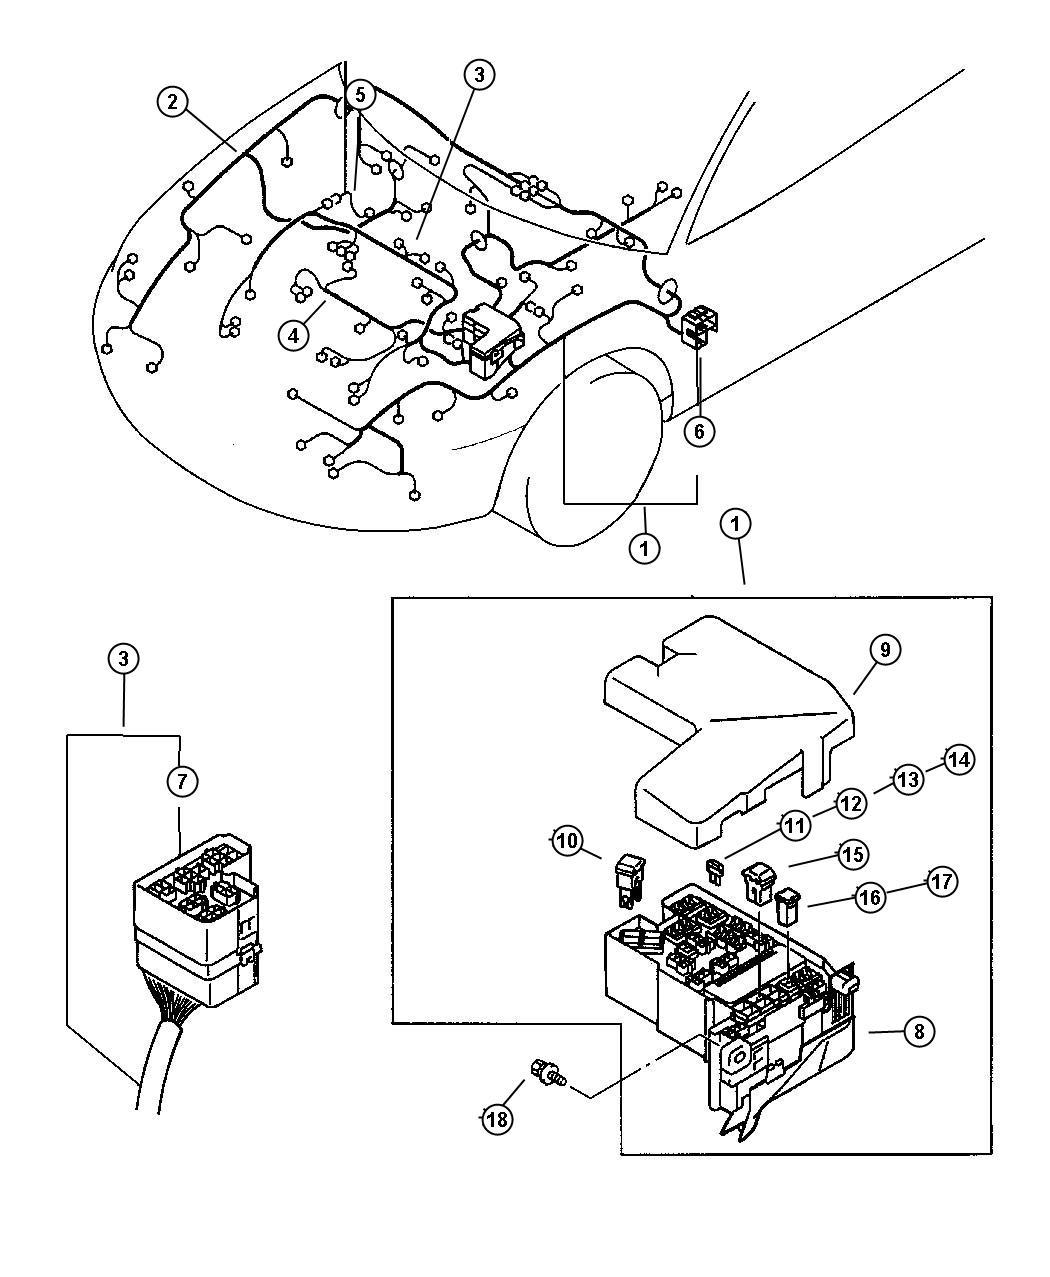 Chrysler Sebring Fusible Link Wiring Green Engine